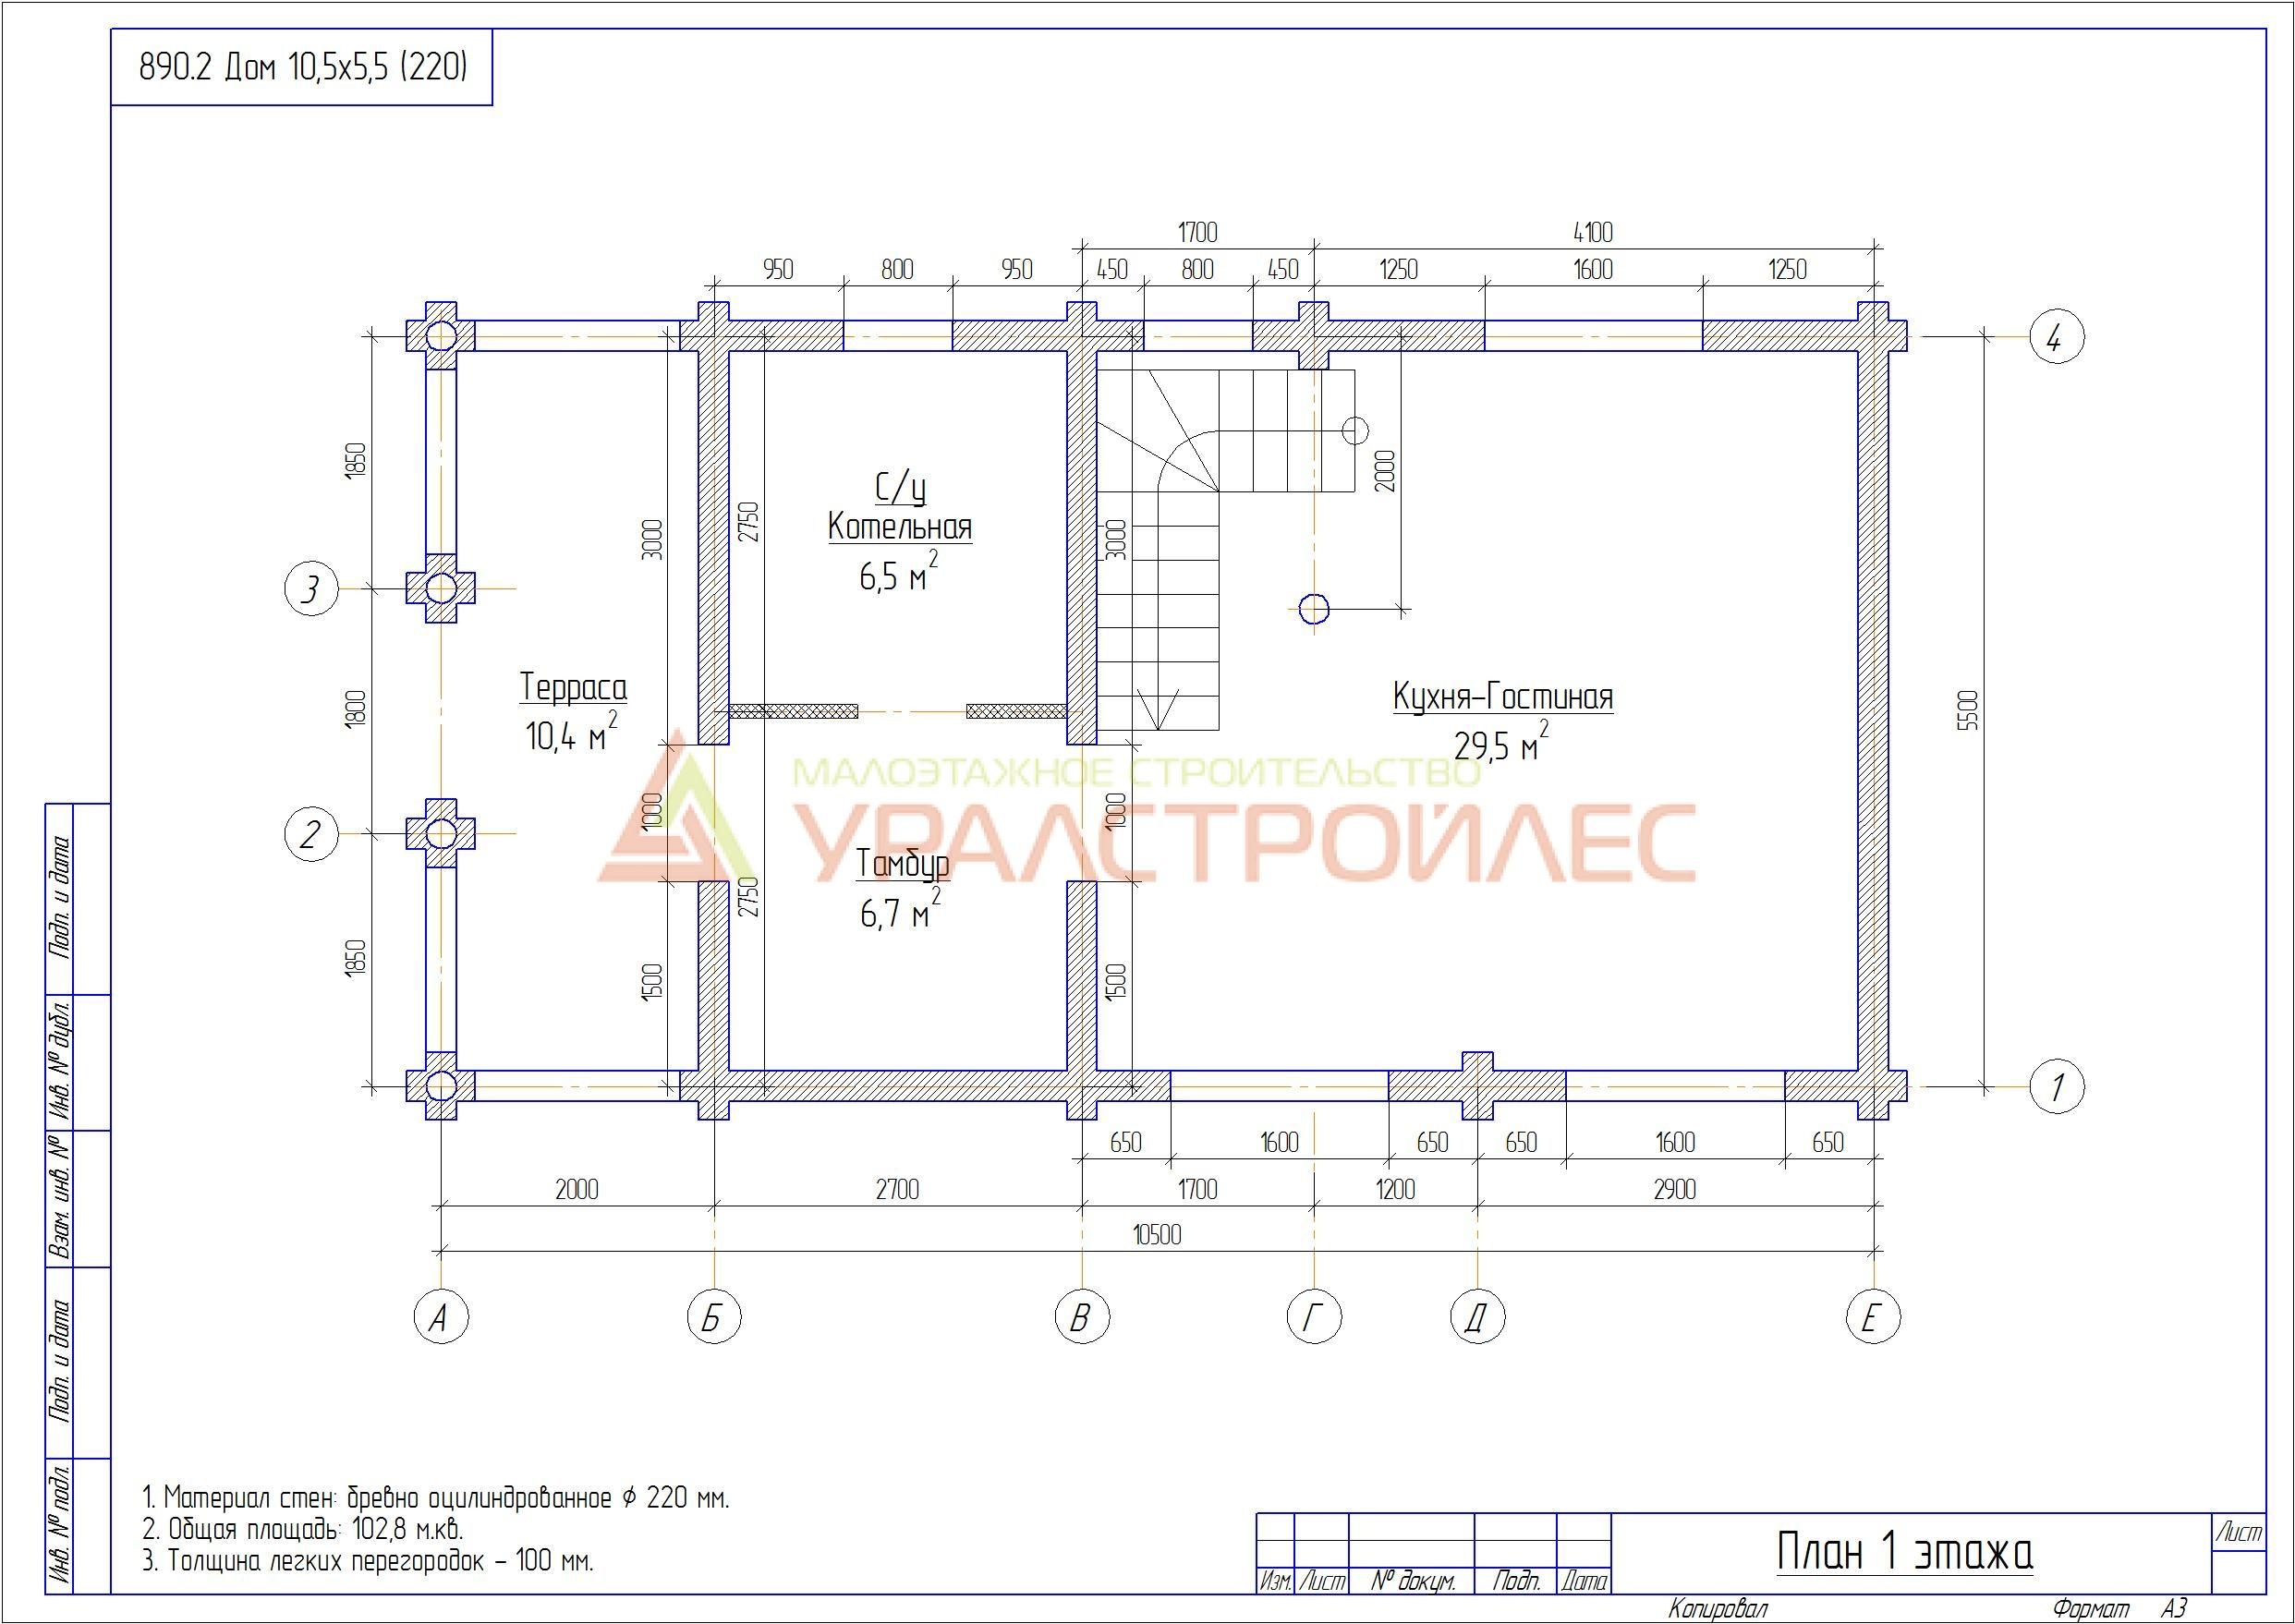 Проект № 890.2 г. Тюмень КП. Решетникова 2